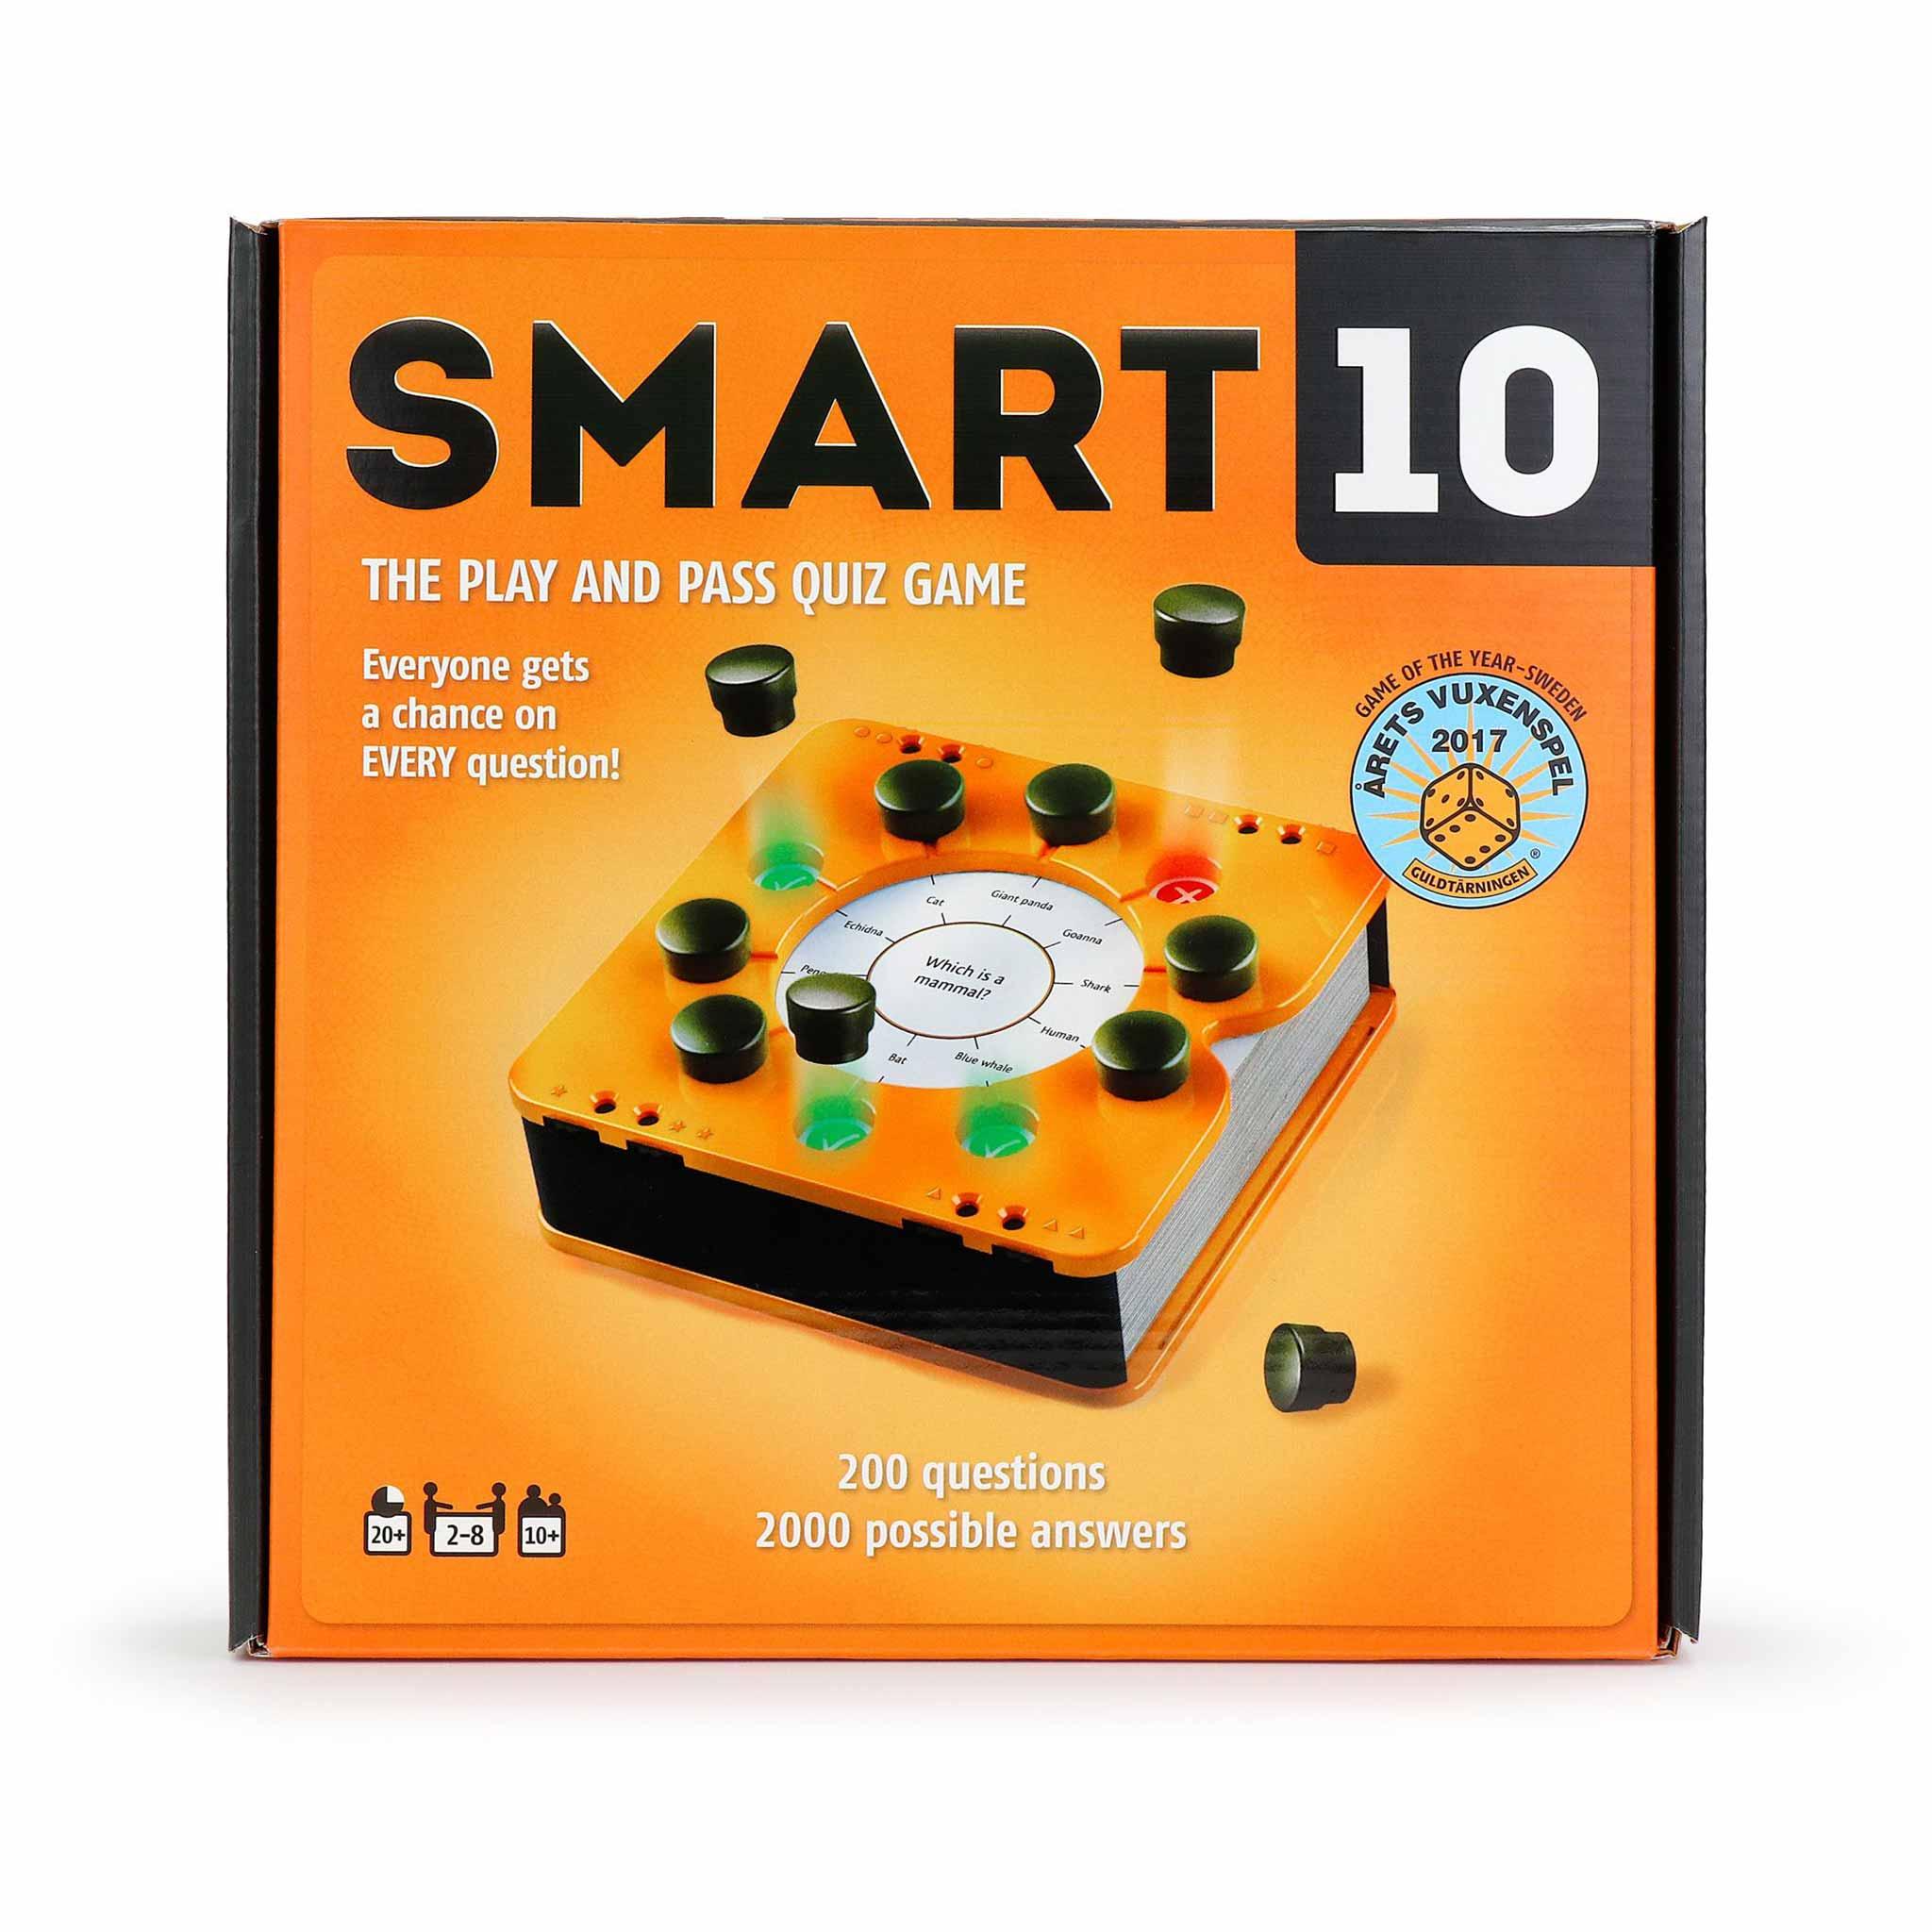 Smart10 Trivia